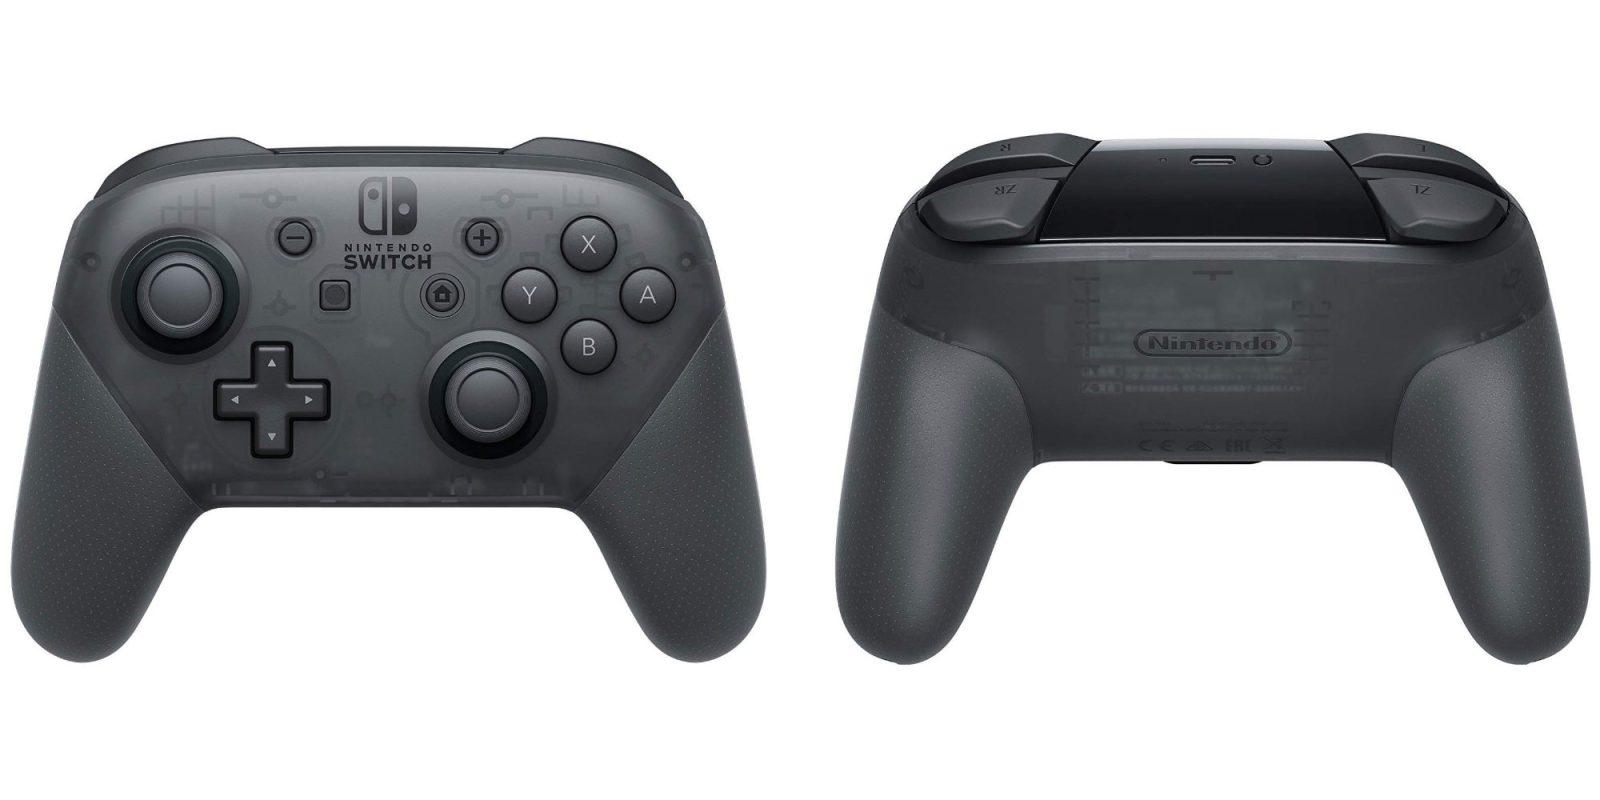 Kick Switch gaming up a notch w/ Nintendo's Pro Controller